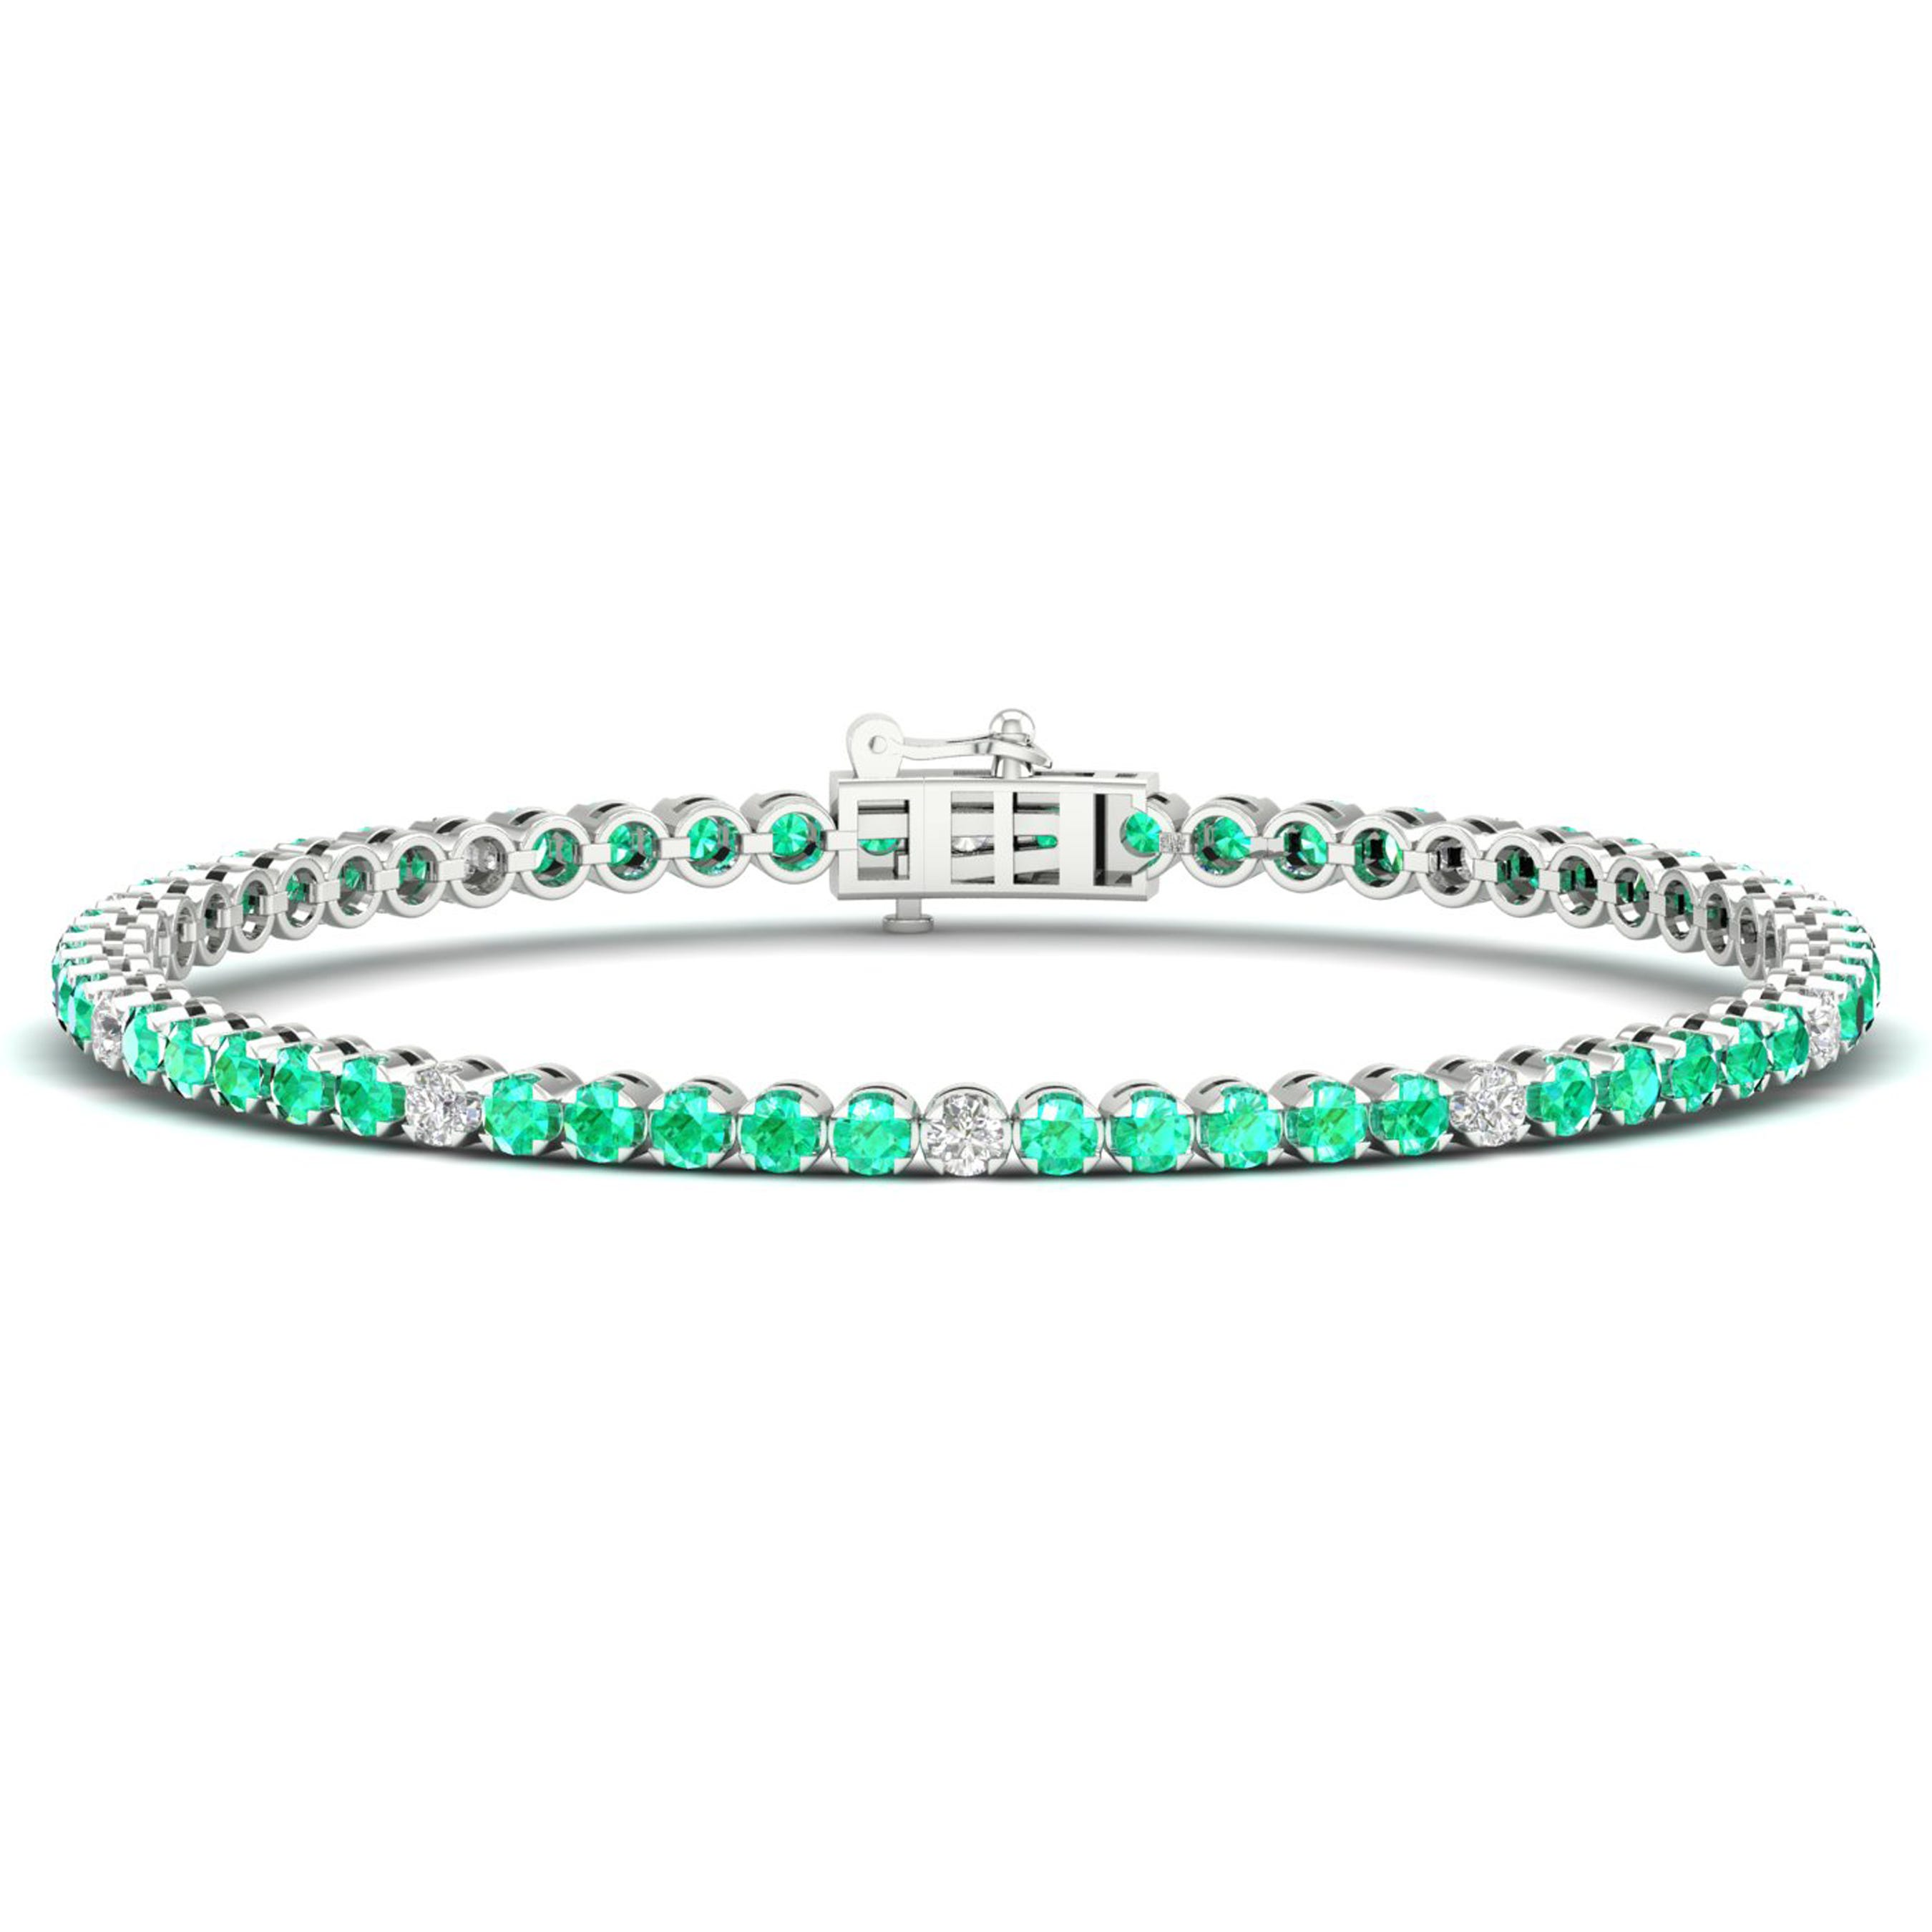 Emerald Tennis Bracelet in 10k White Gold